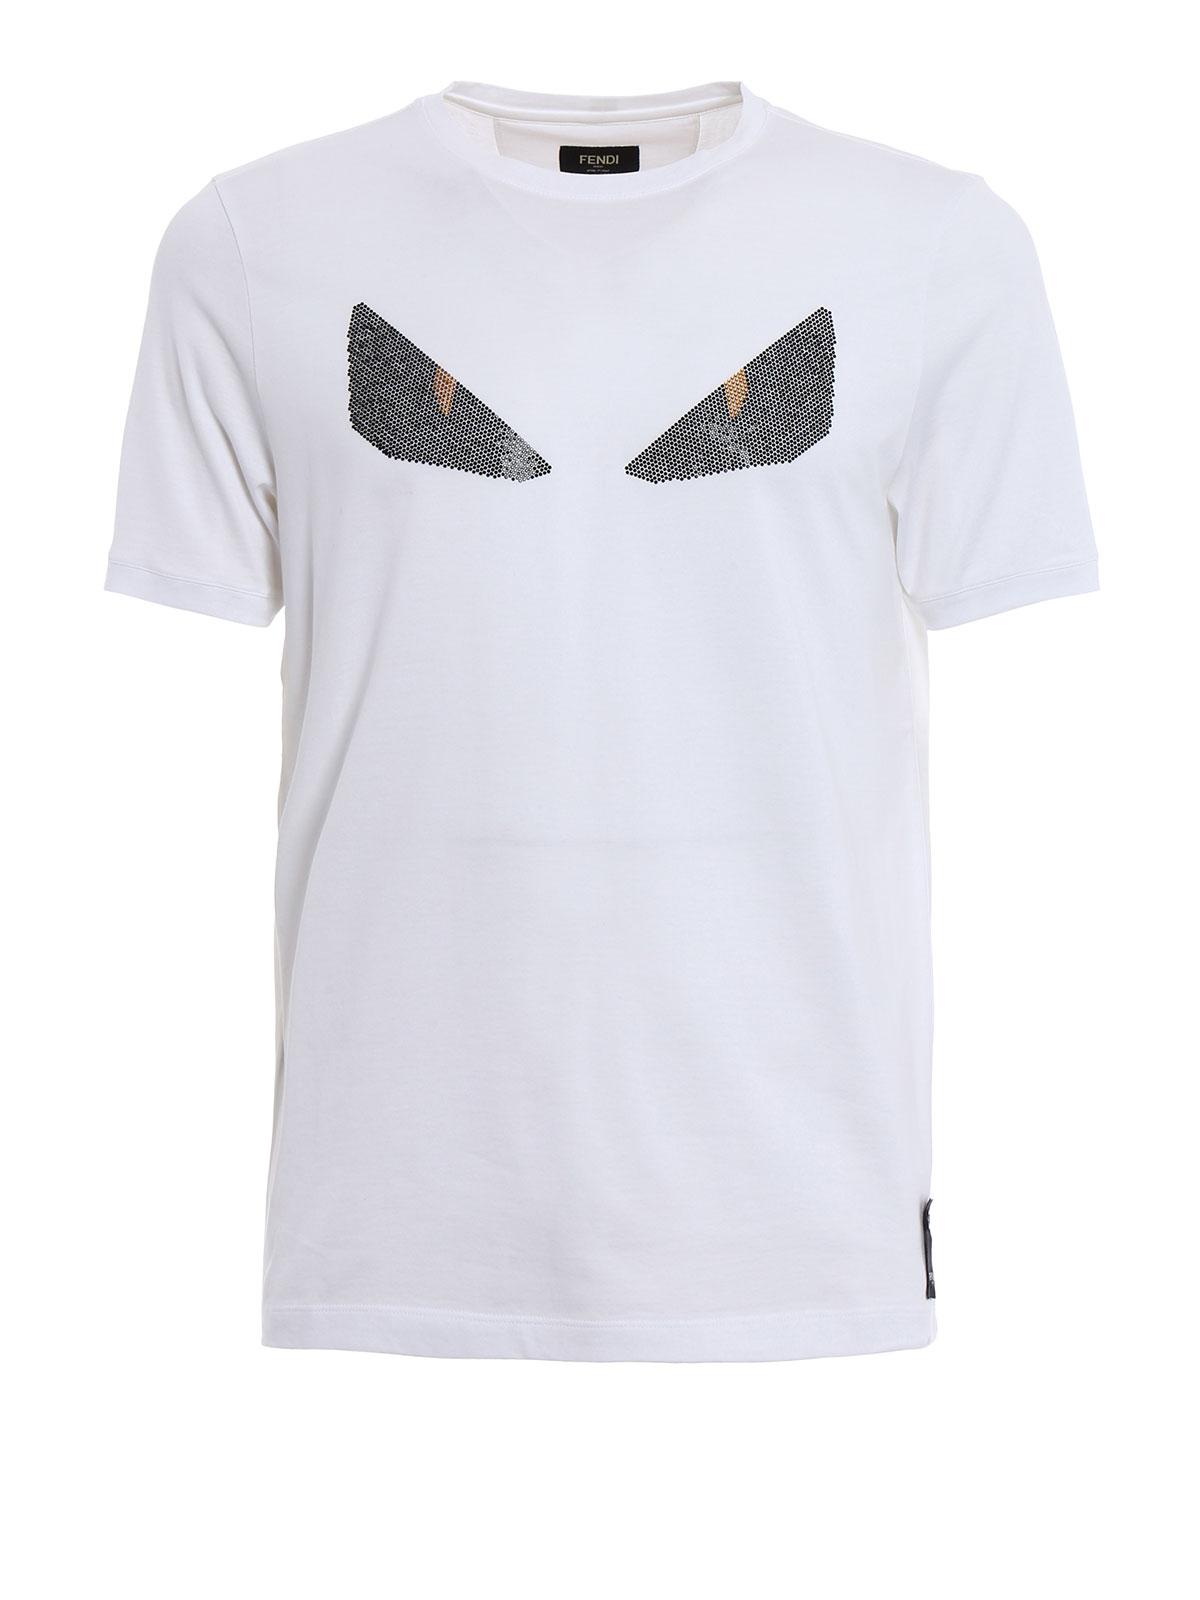 1f0f0155 Fendi - Monster eye rhinestone T-shirt - t-shirts - FY0682 1JJ QA0